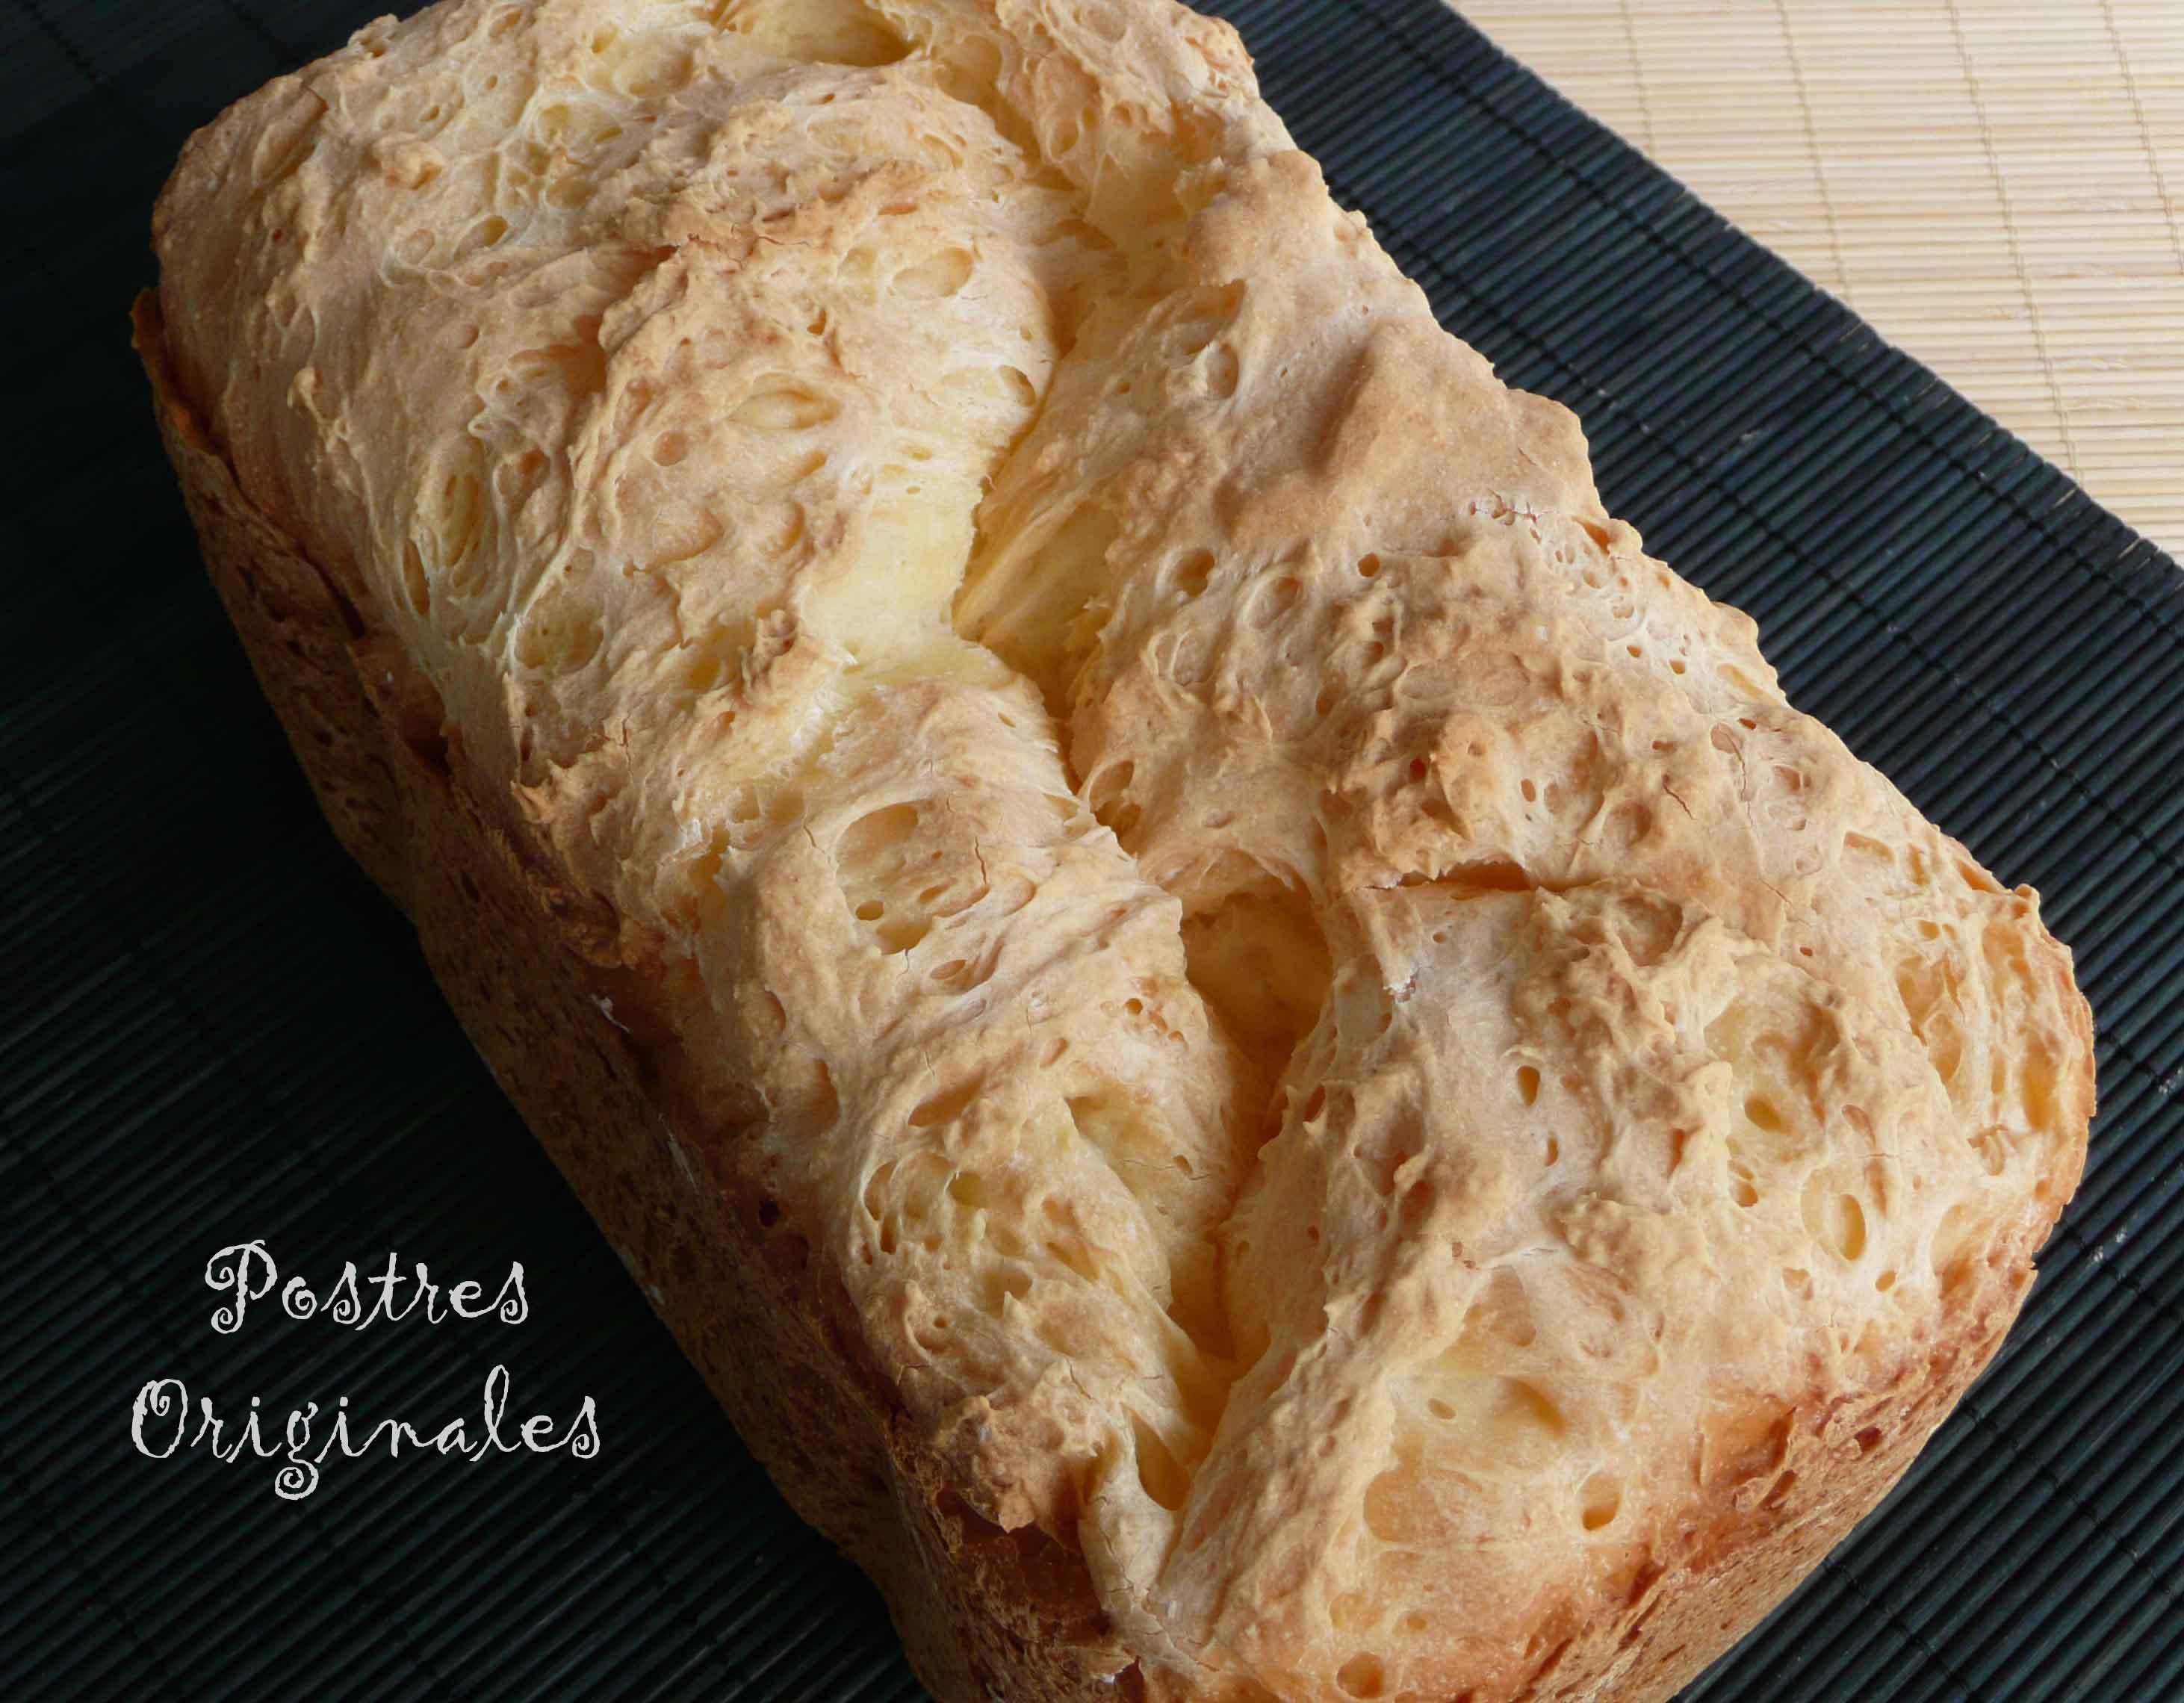 pan de maiz sin gluten y maicena